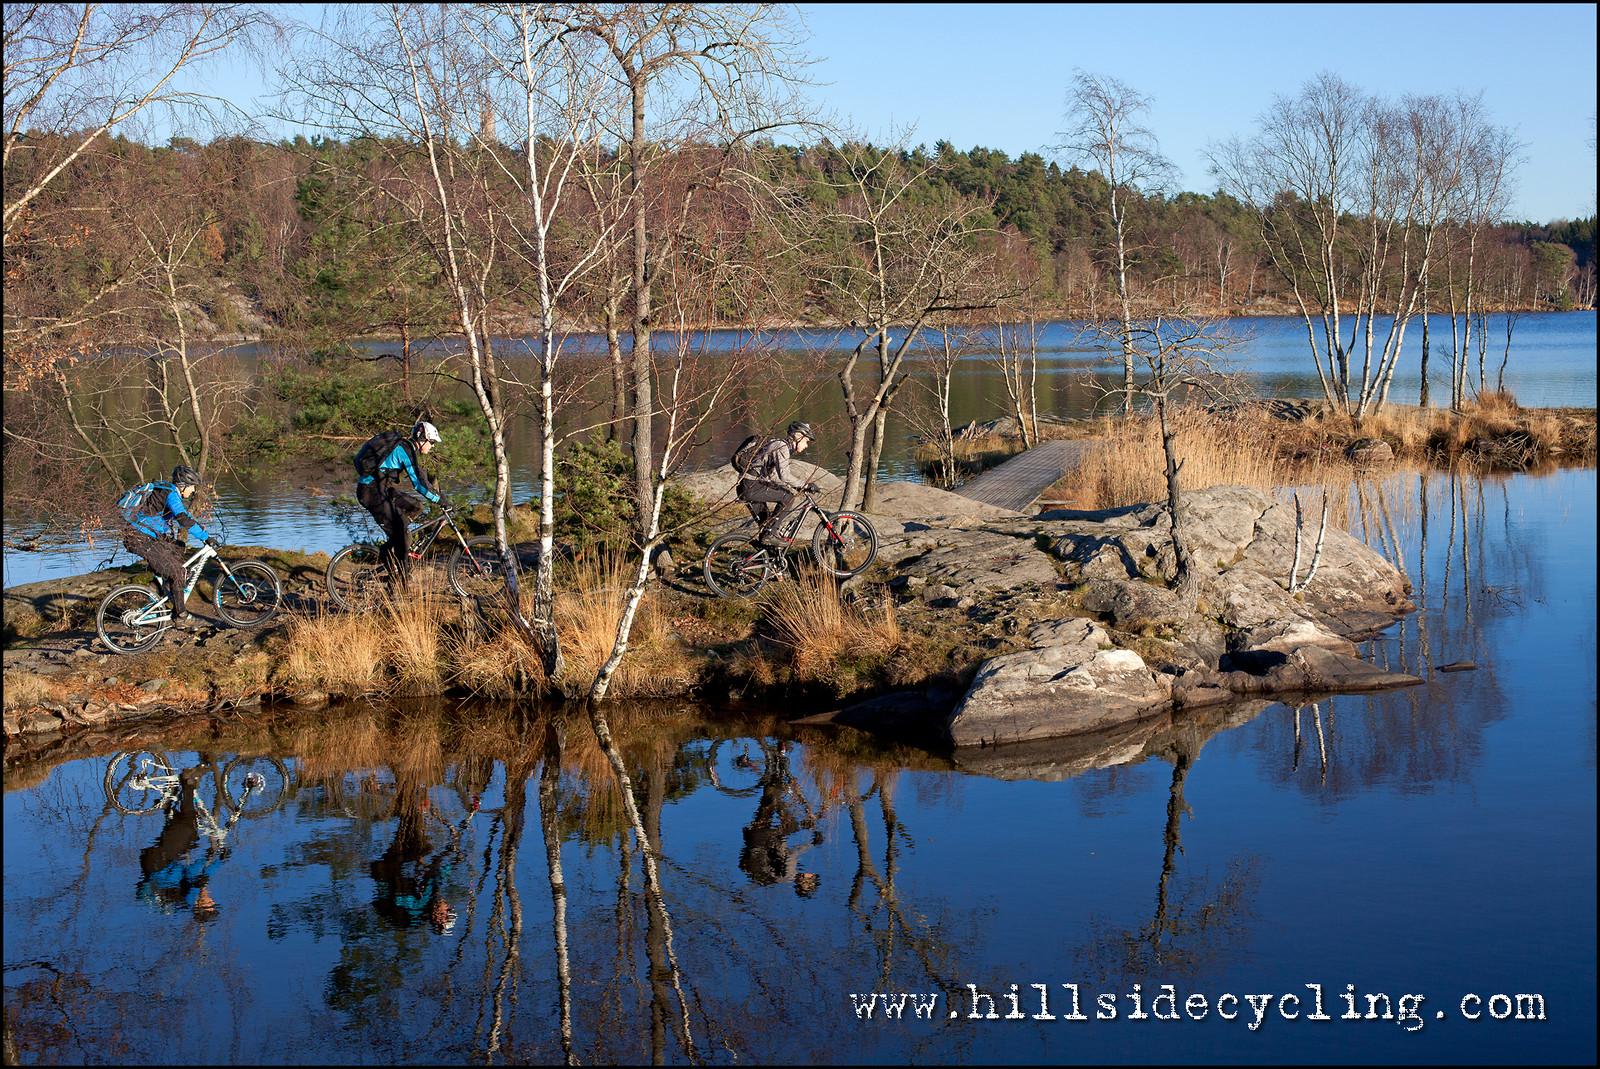 Three Amigos - Hillside Cycling - Mountain Biking Pictures - Vital MTB